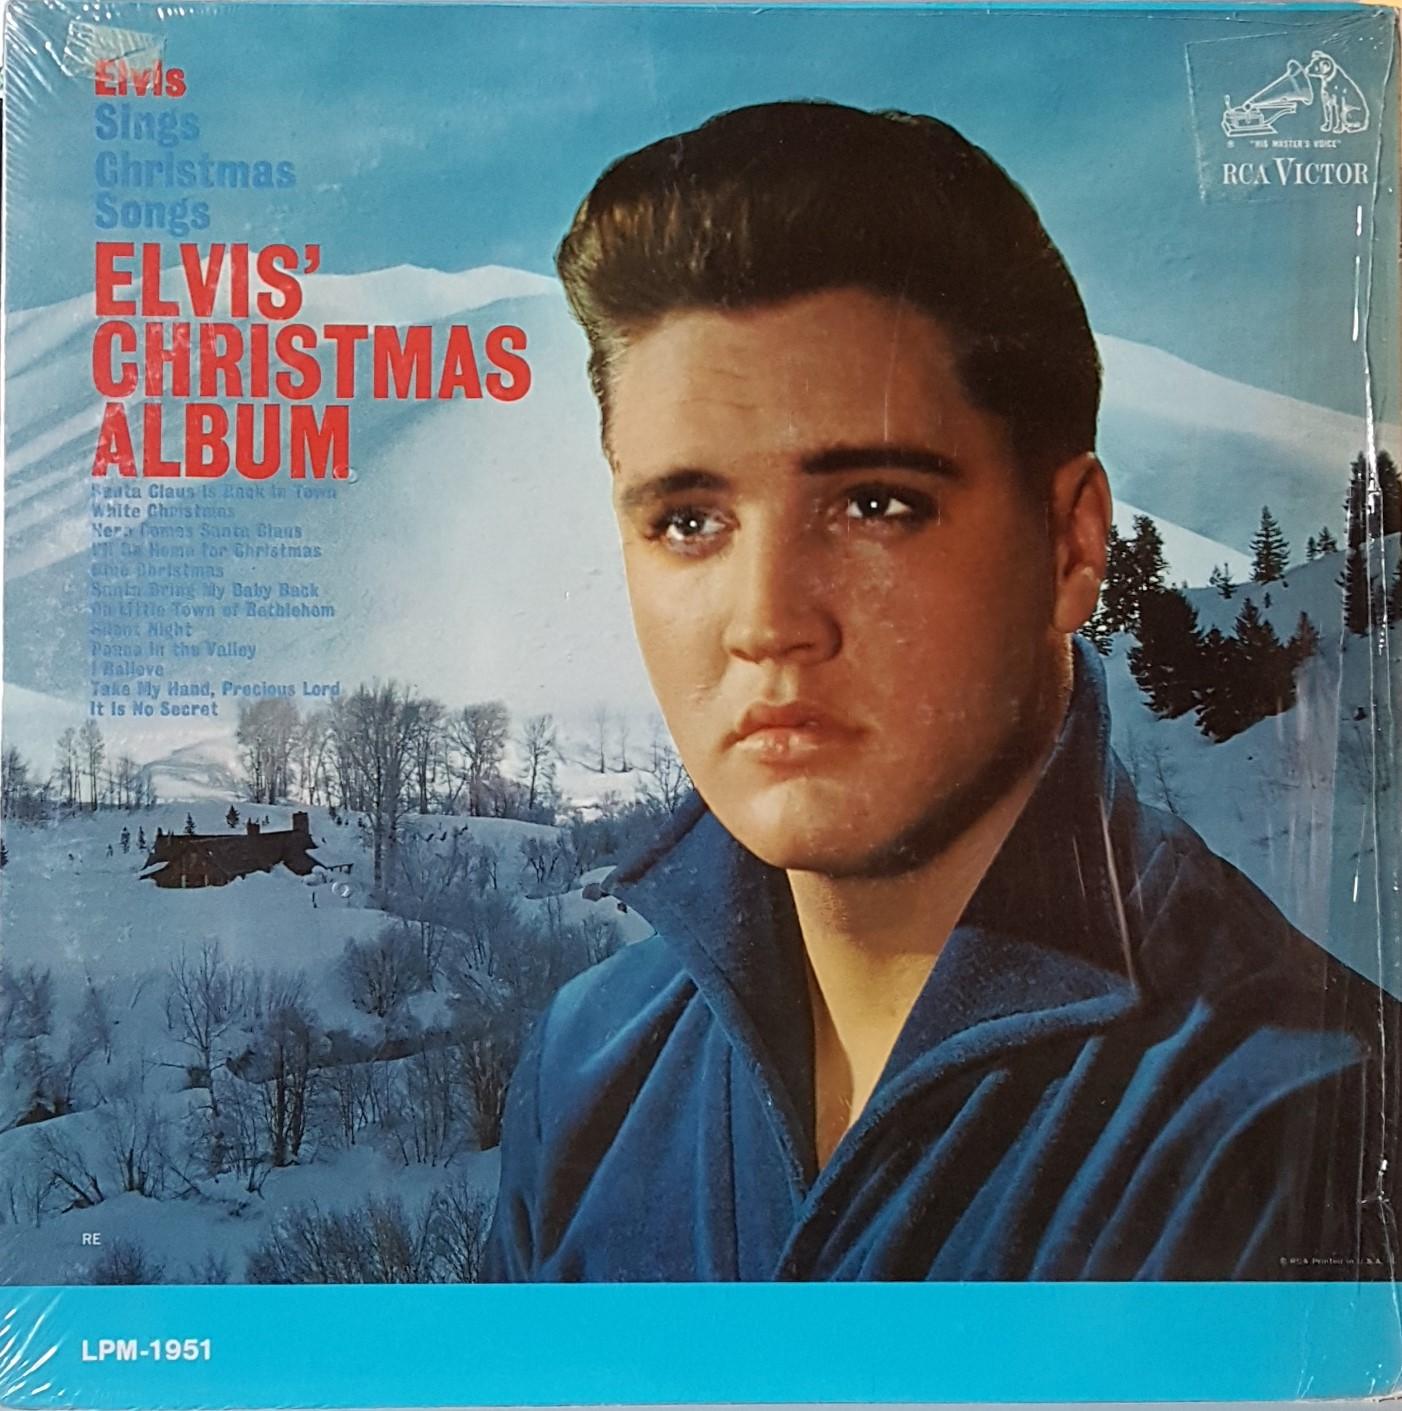 ELVIS' CHRISTMAS ALBUM 20200324_175047hck49